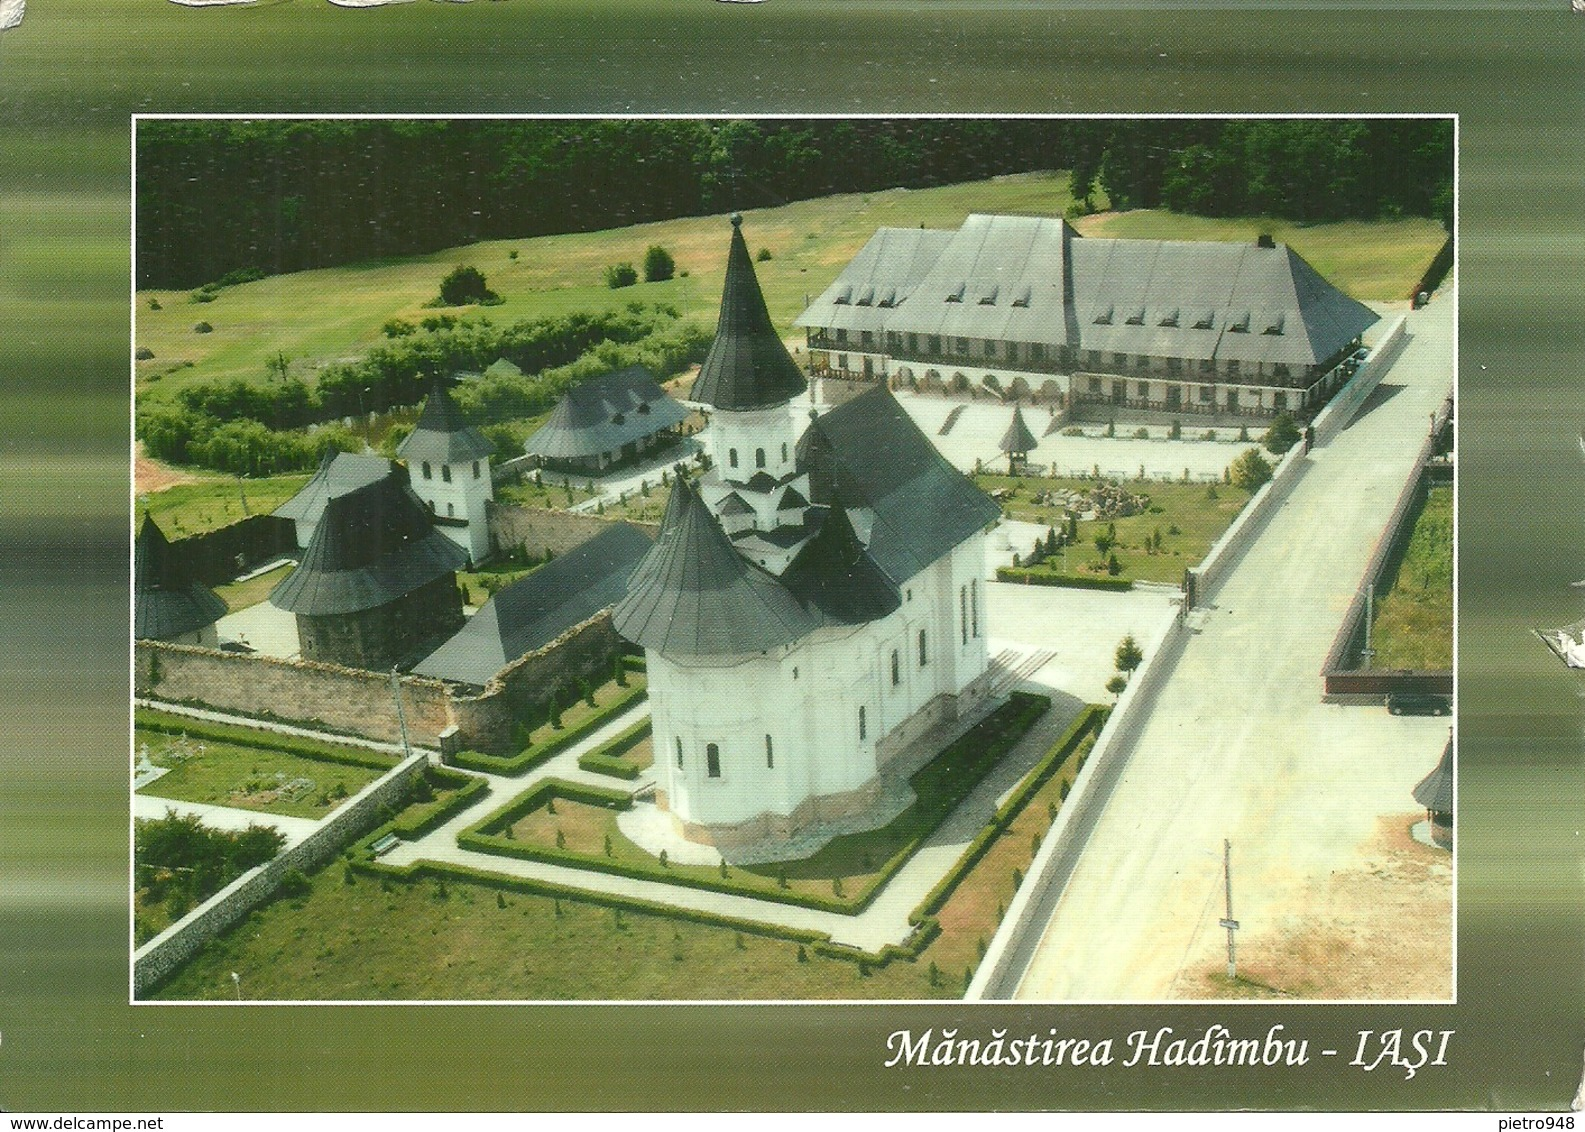 Manastirea Hadimbu (Romania) Judetul Iasi, Vedere De Ansamblu, Veduta Aerea, Aerial View - Romania